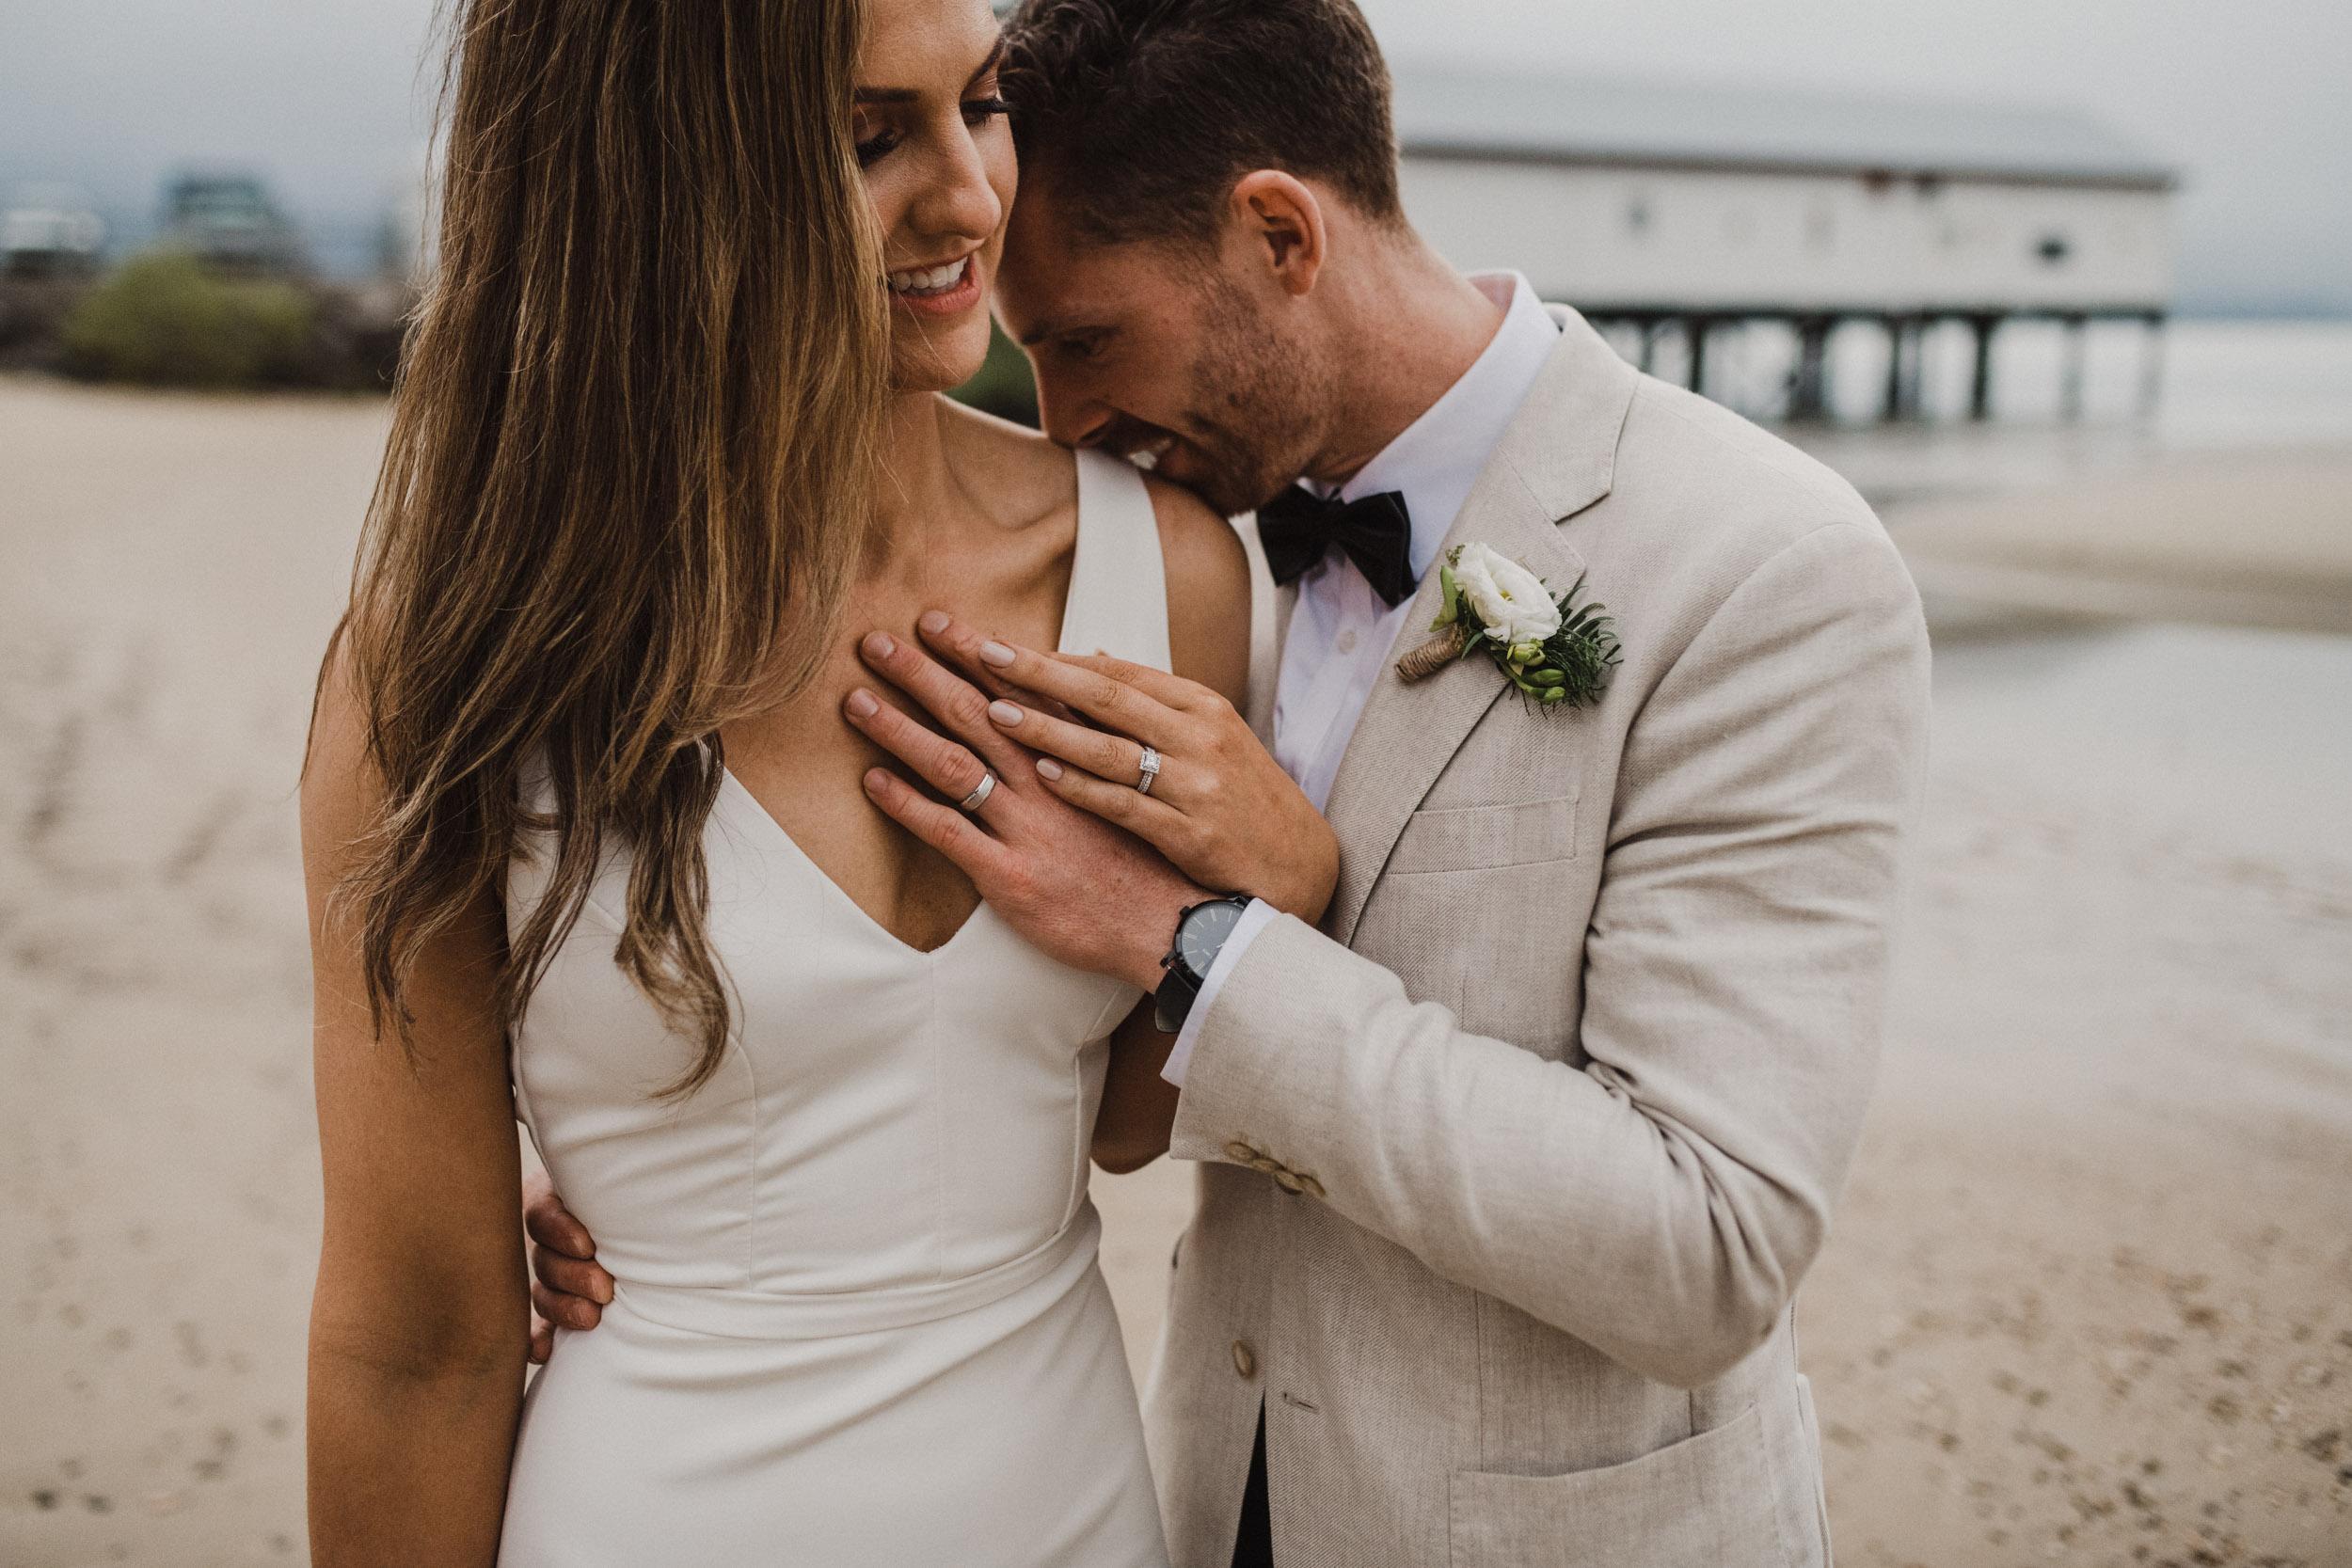 The Raw Photographer - Cairns Wedding Photographer - Port Douglas - Sugar Wharf - Vasaliki Couture Dress - Destination Venue-68.jpg